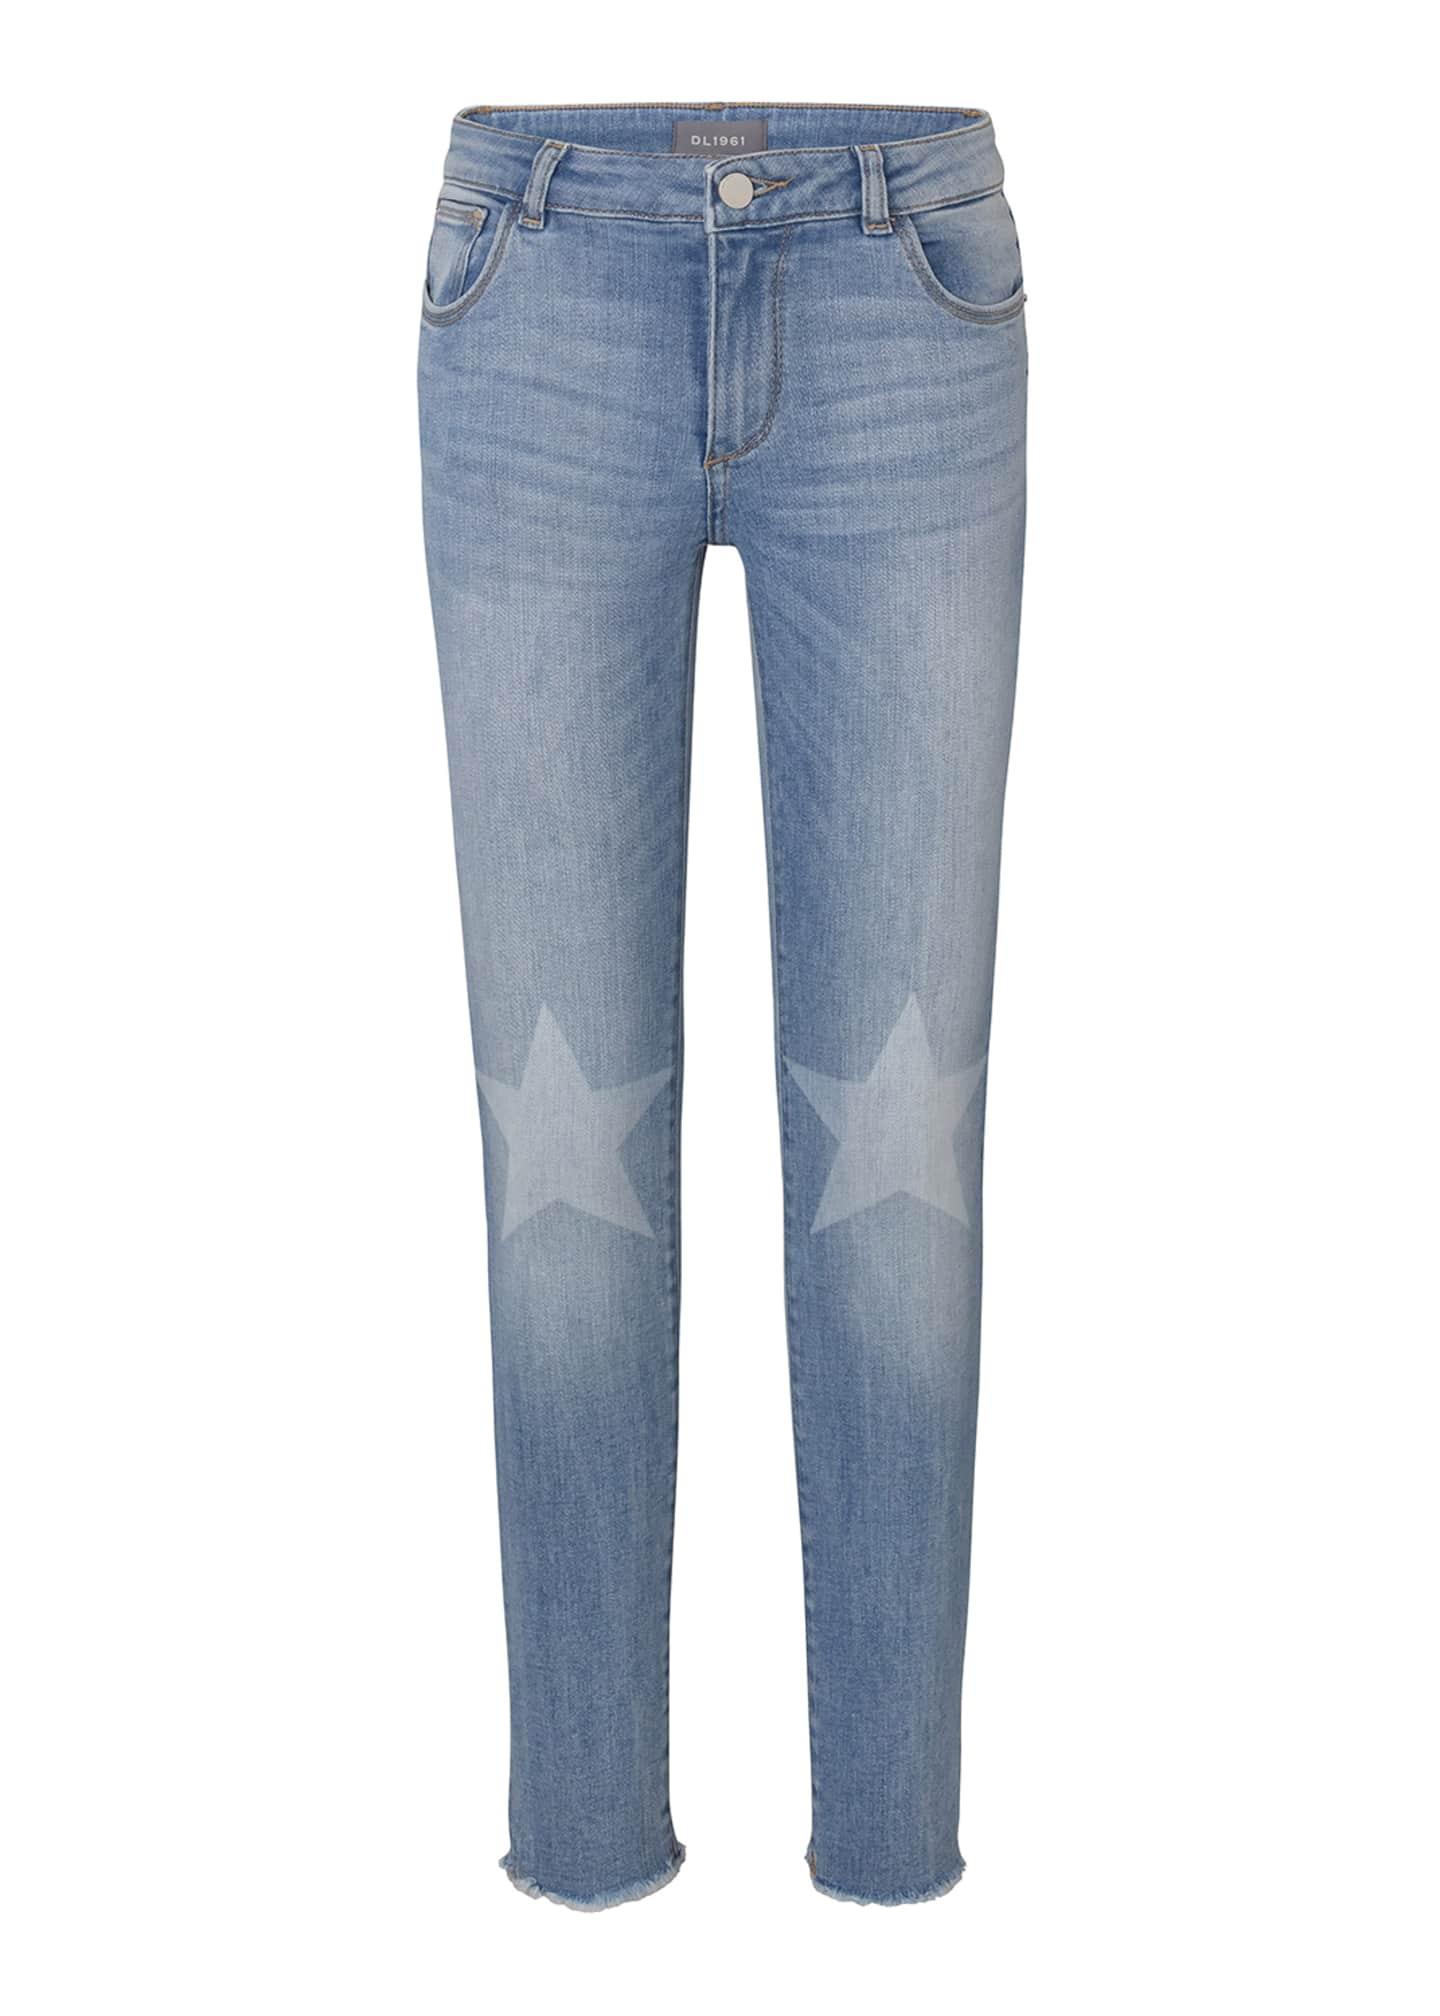 DL1961 Premium Denim Chloe Skinny Jeans w/ Contrast